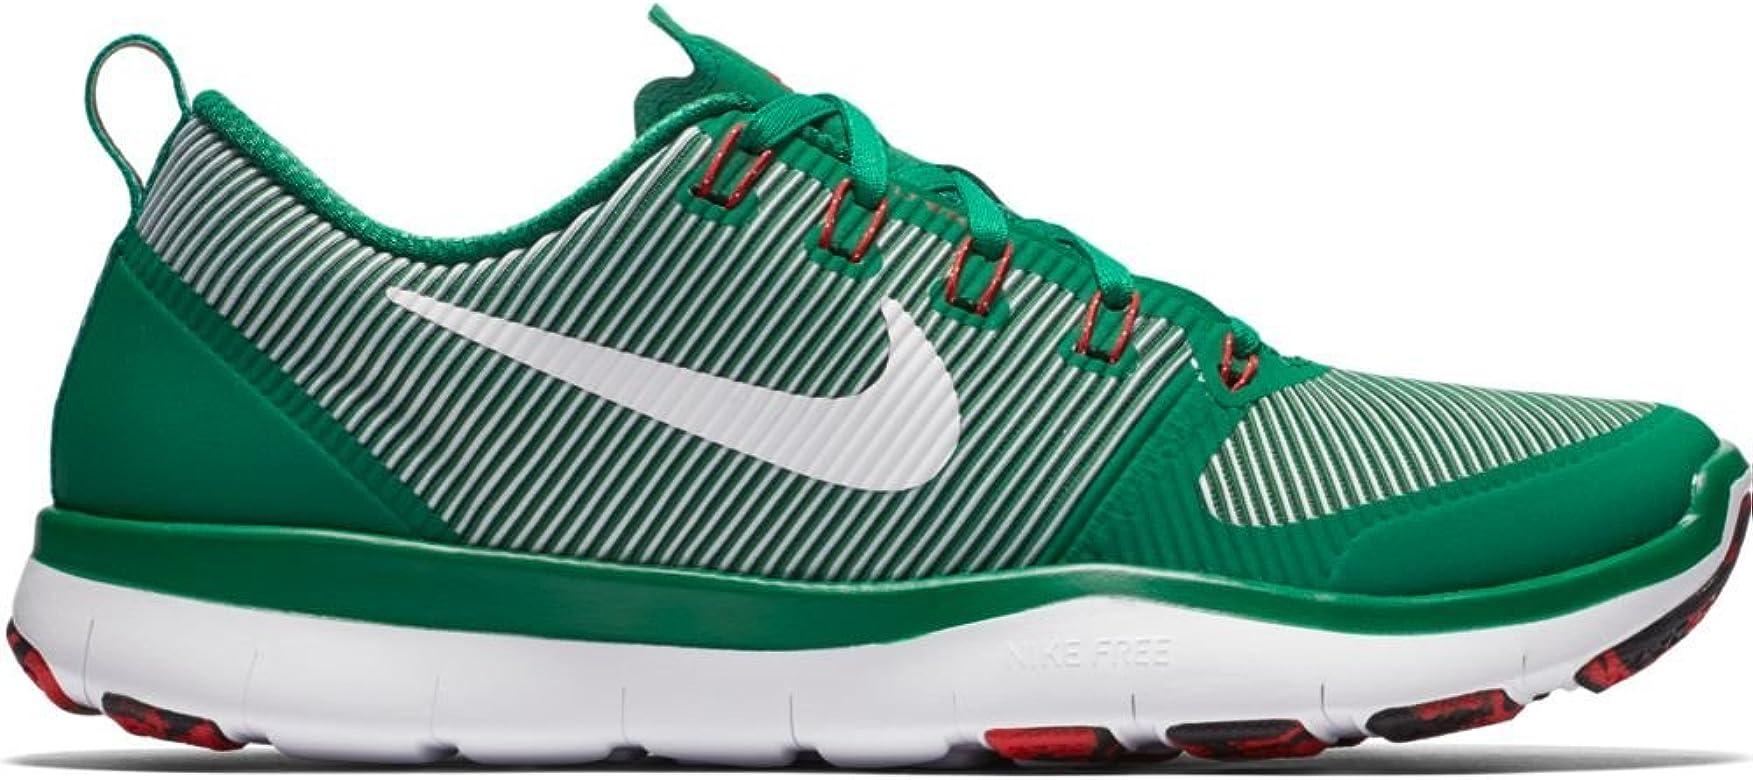 Free Train Versatility Amp Training Shoe [PINE GREEN]